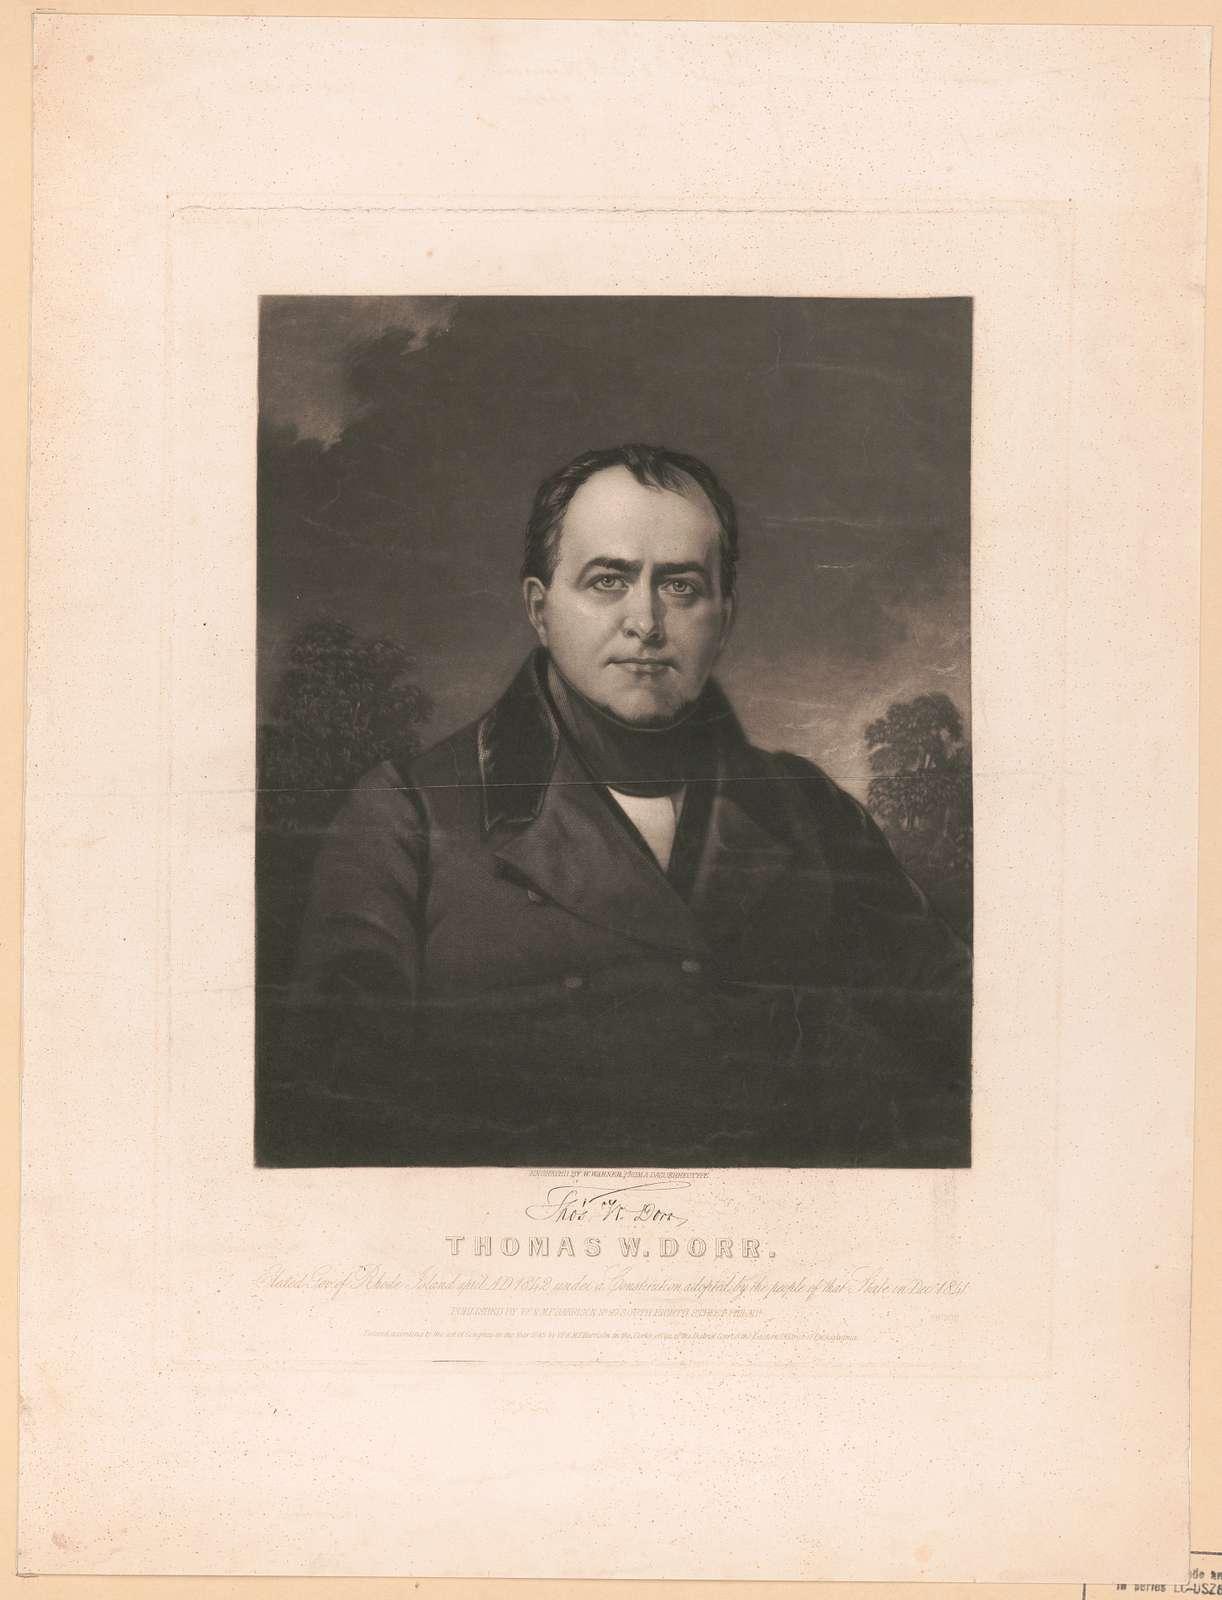 Thomas W. Dorr